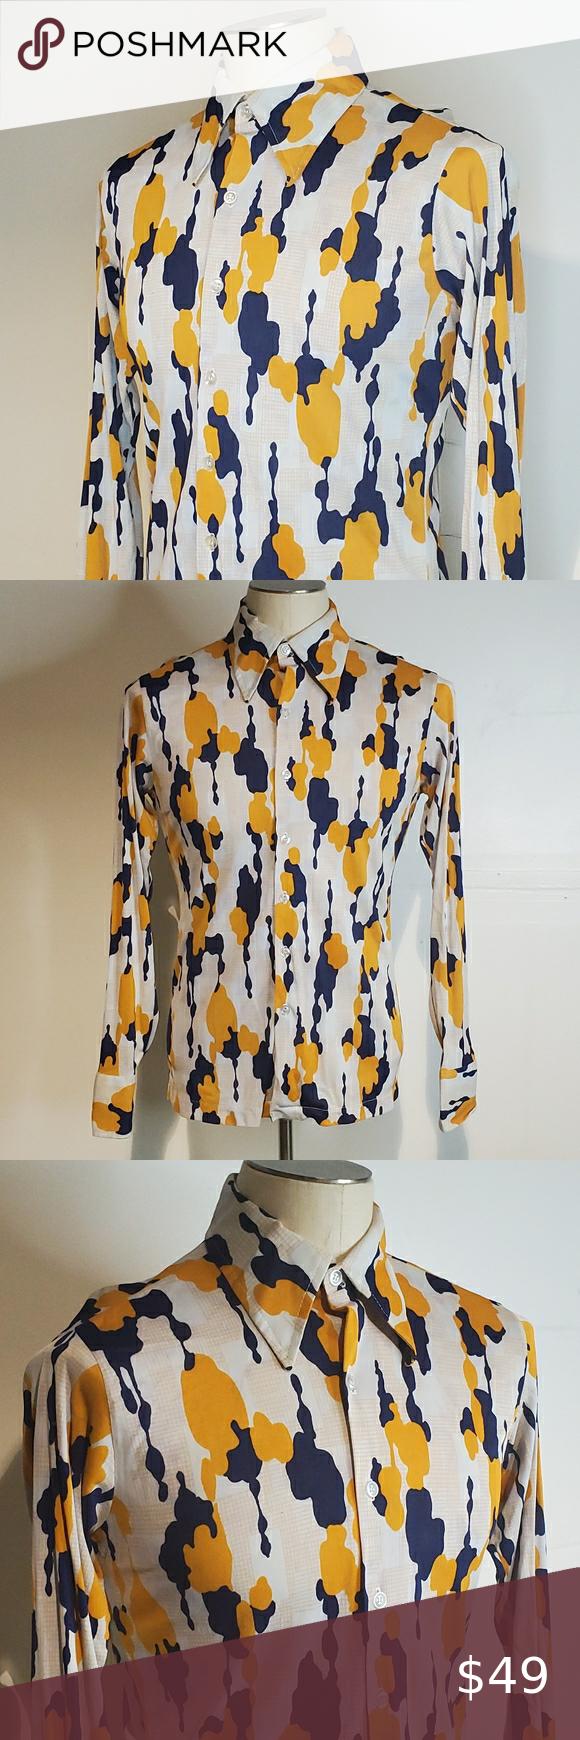 Original Vintage Long Sleeve Disco Shirt Mr. Sport